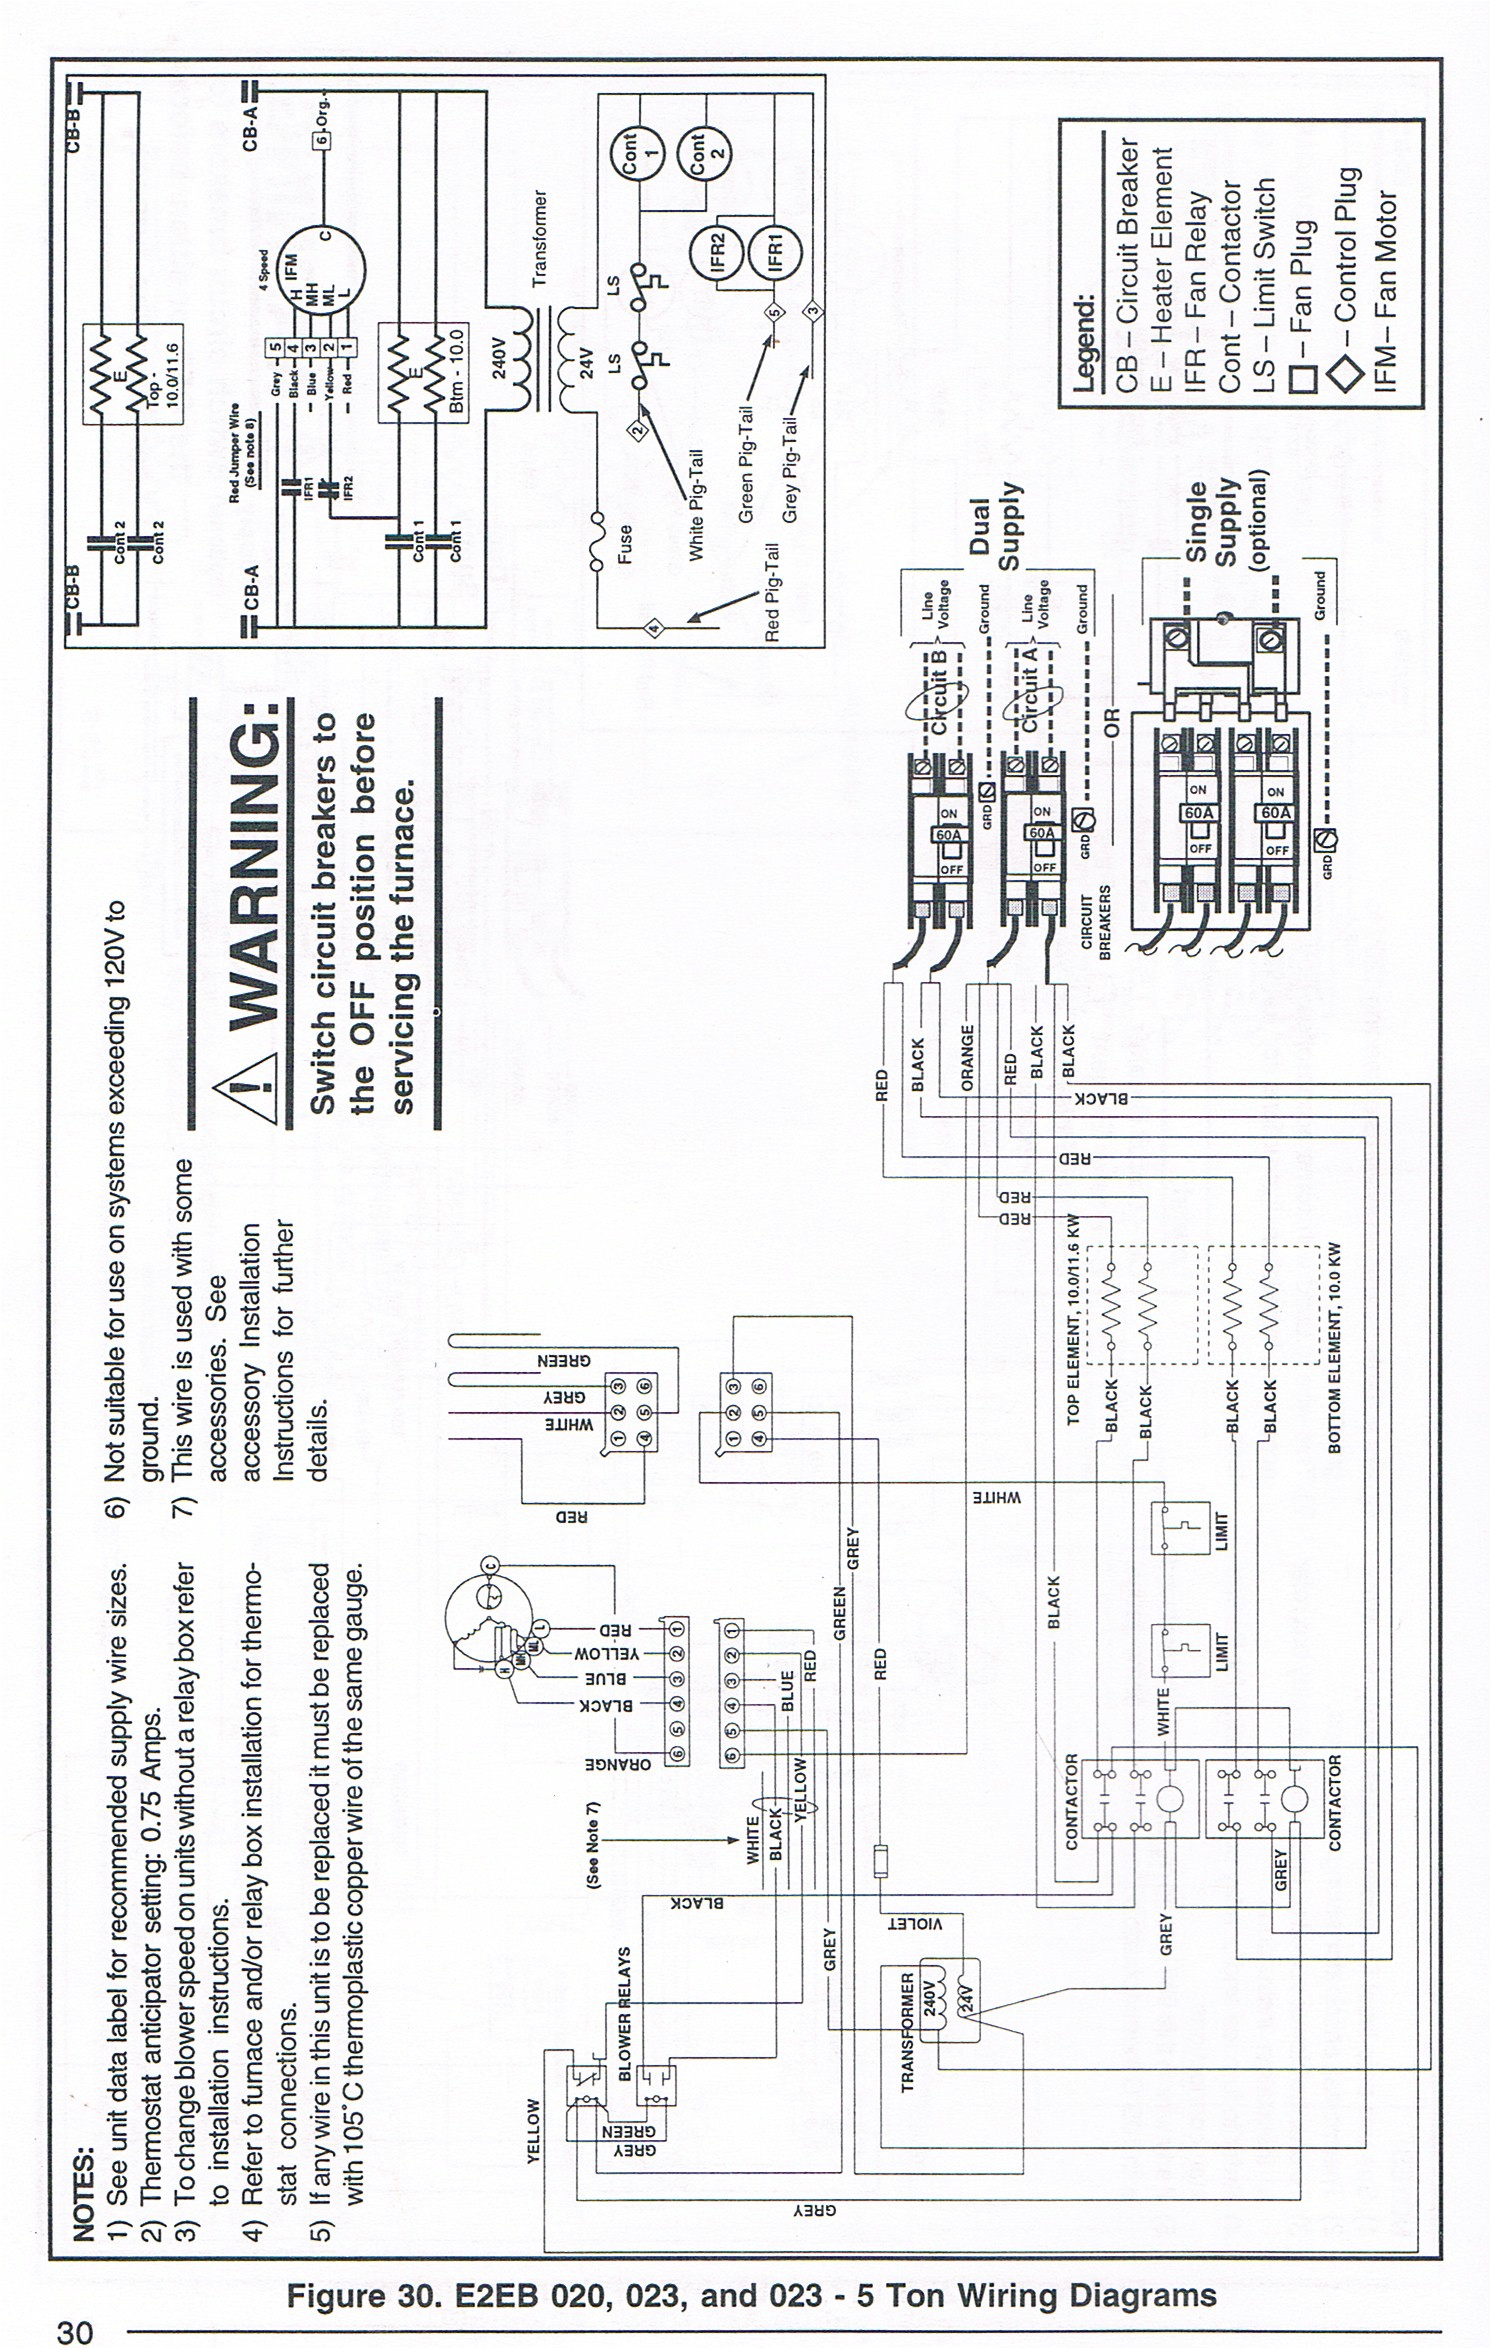 wiring intertherm diagram furnace electric e2eb 012h wiring intertherm e2eb 012ha wiring diagram e2eb 012ha wiring diagram